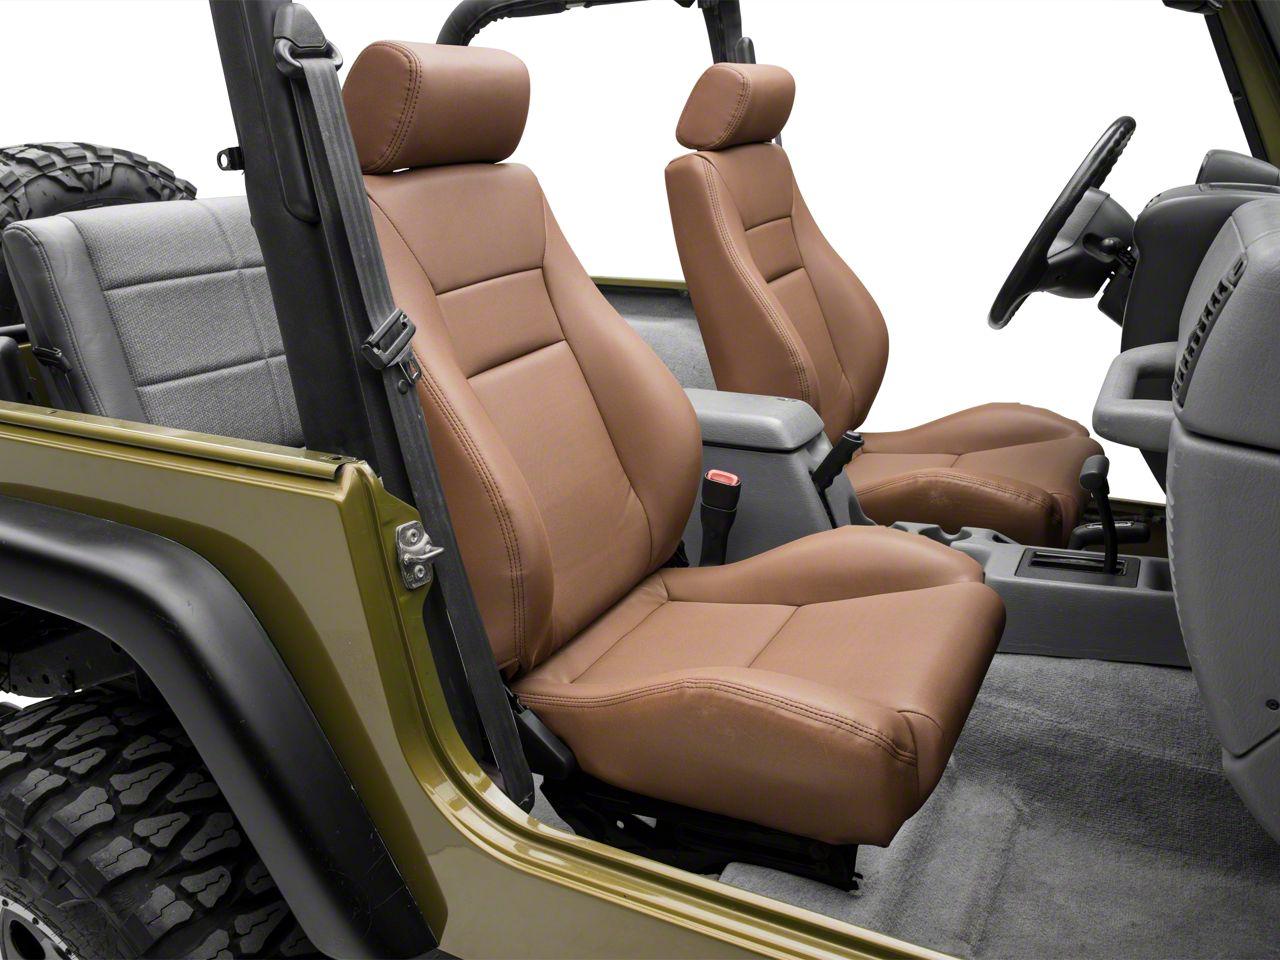 Smittybilt Front Contour Sport Bucket Reclining Seat - Spice Denim (87-02 Jeep Wrangler YJ & TJ)